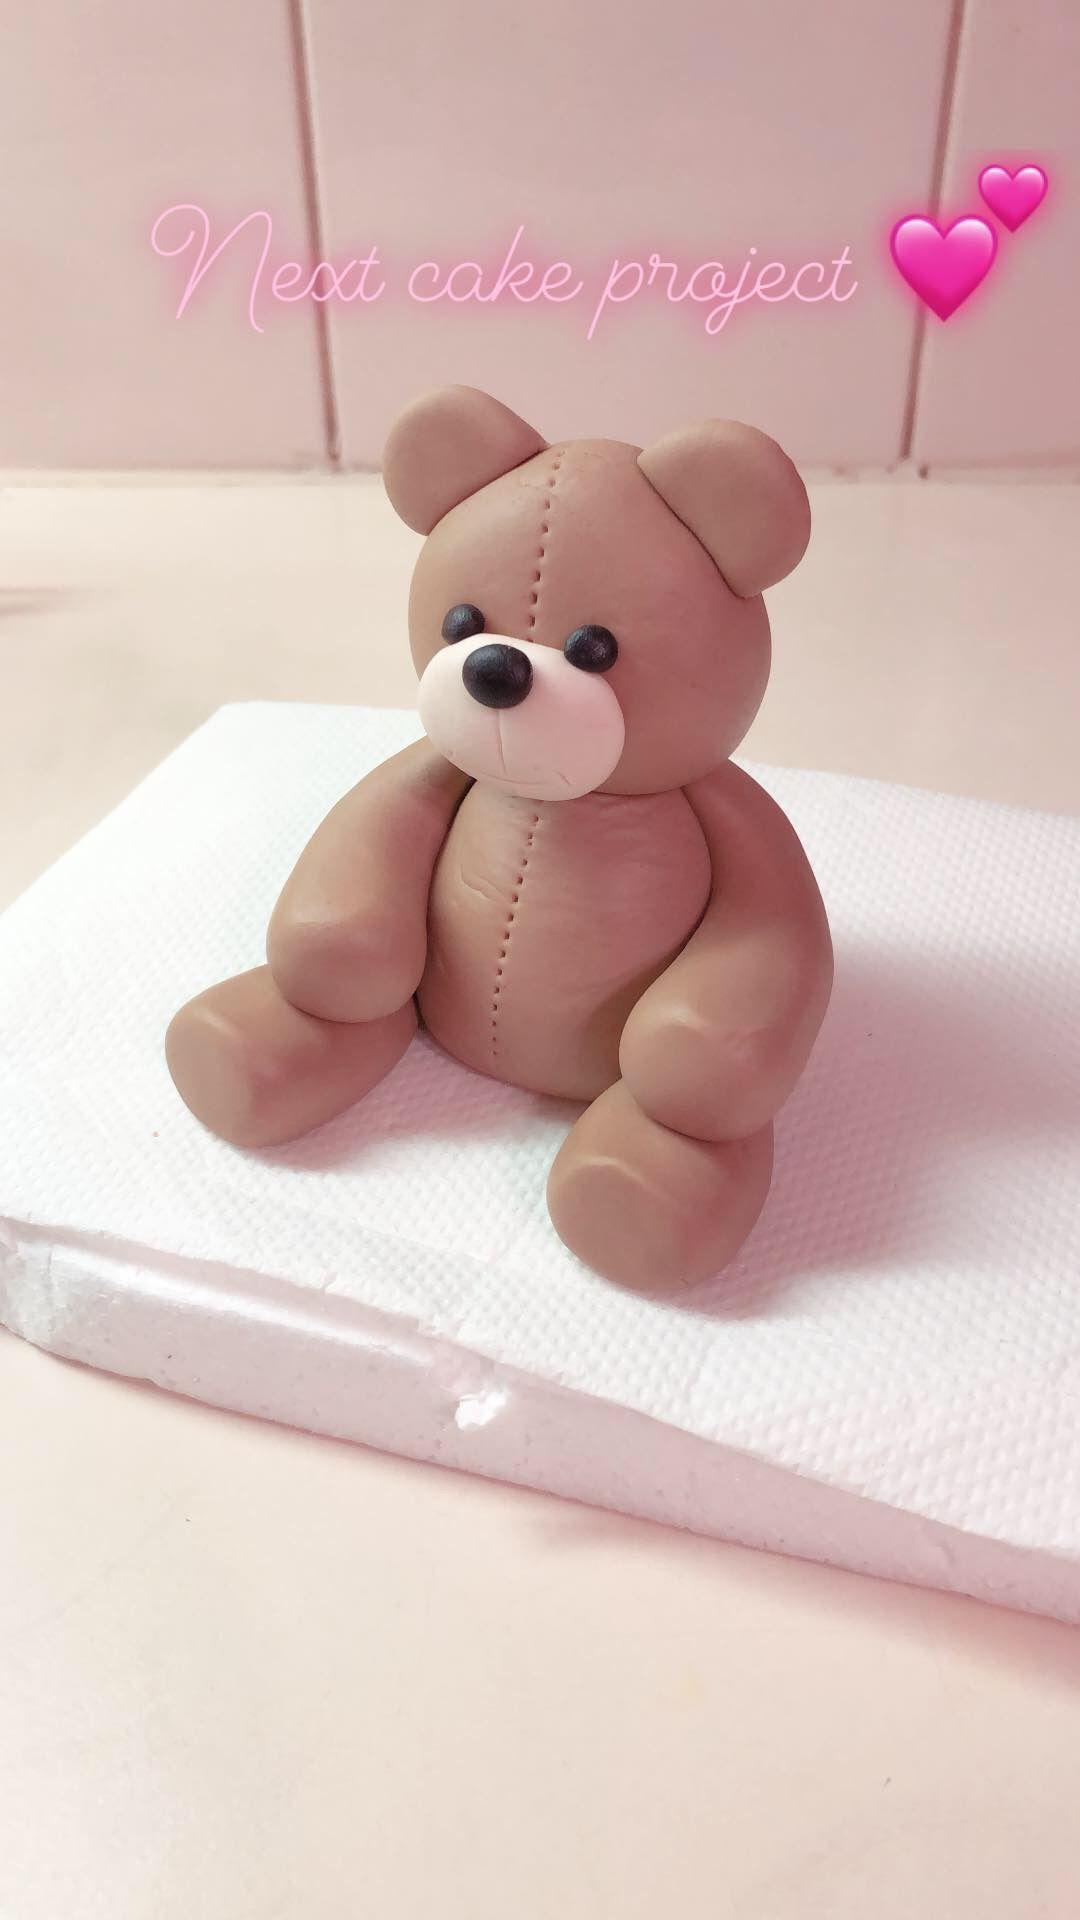 Free Crochet Bear Patterns – Amigurumi Patterns #teddybearpatterns - rainbow falls #teddybear